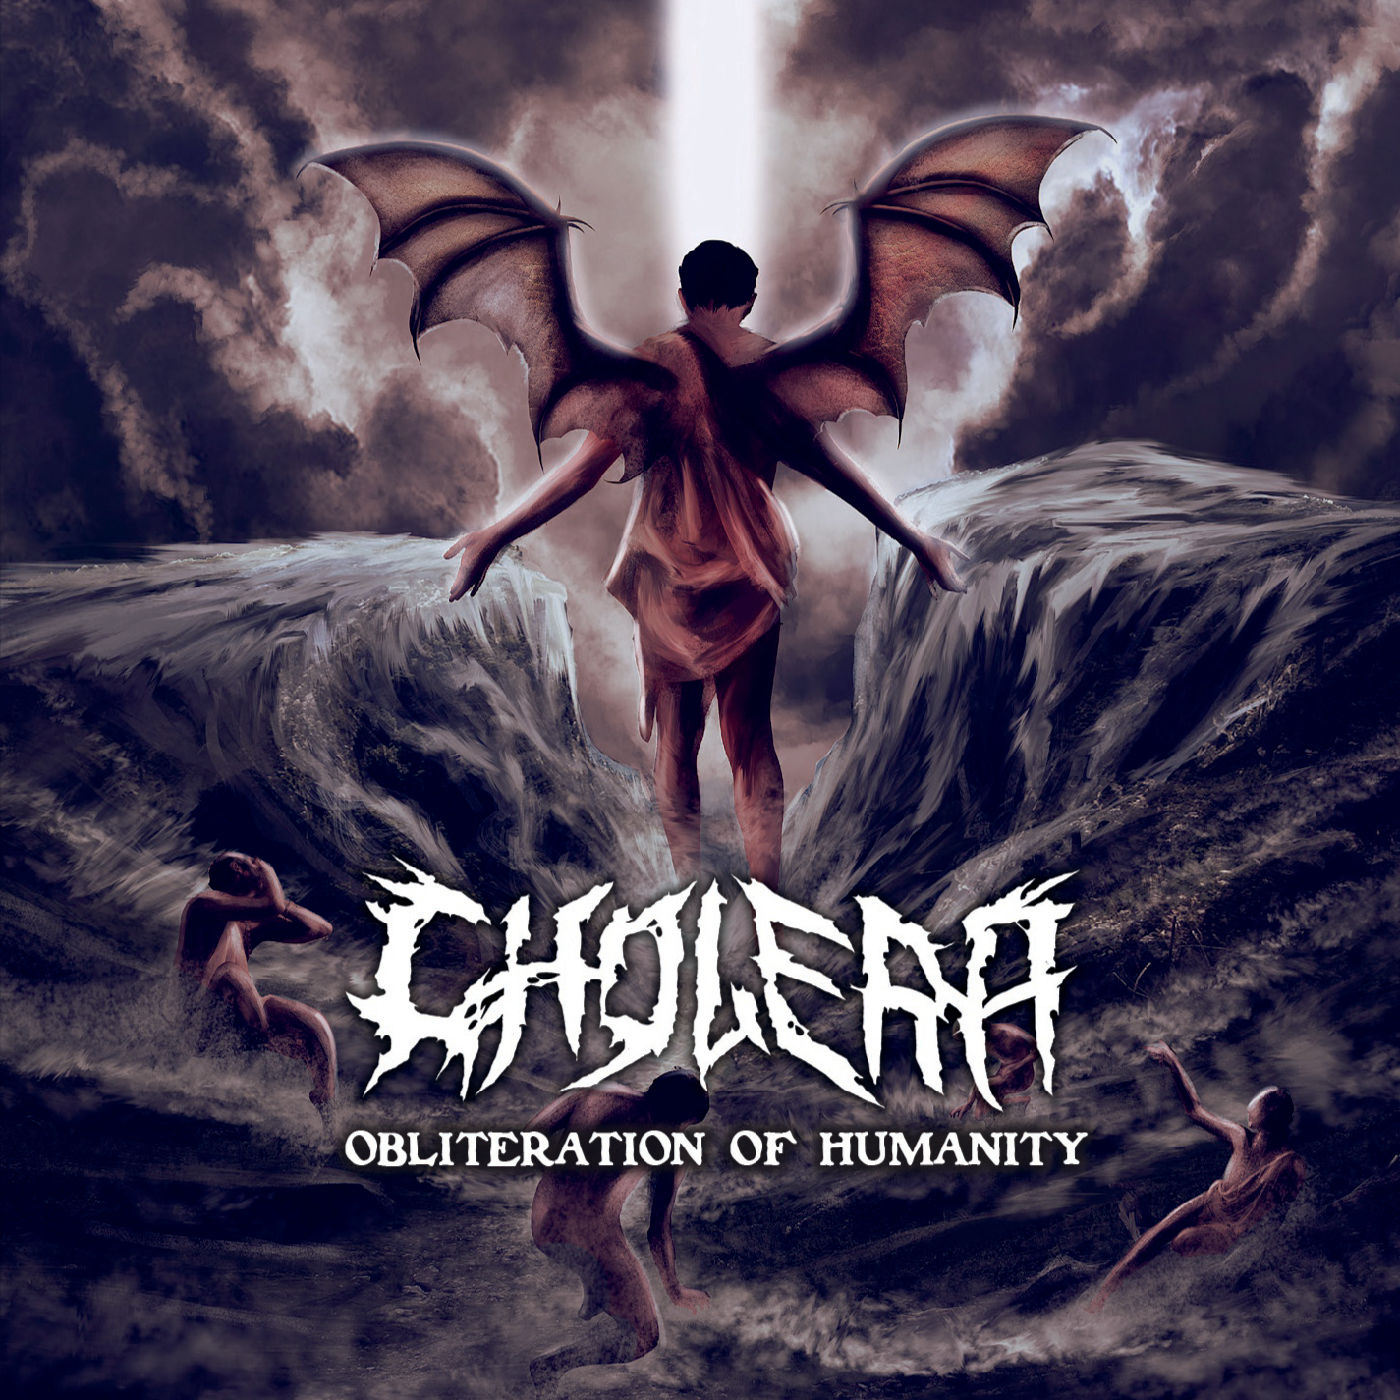 Cholera – Obliteration of Humanity (2019)